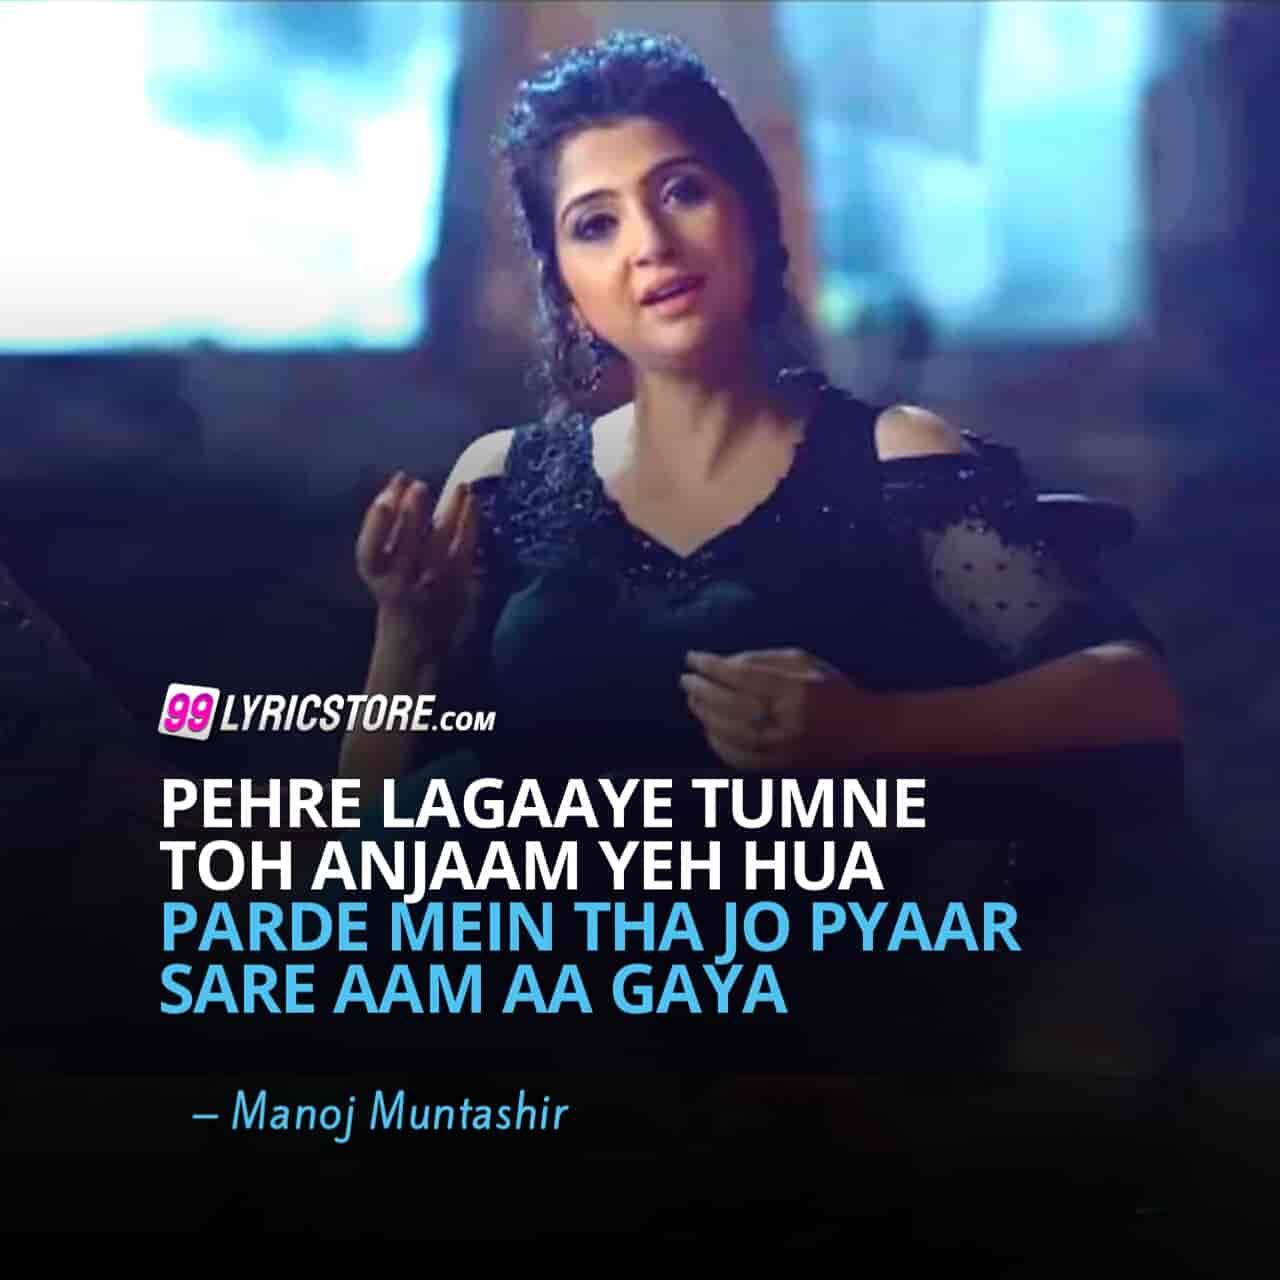 Tera Khayal Hindi Songs Lyrics Sung by Kaushiki Chakraborthy